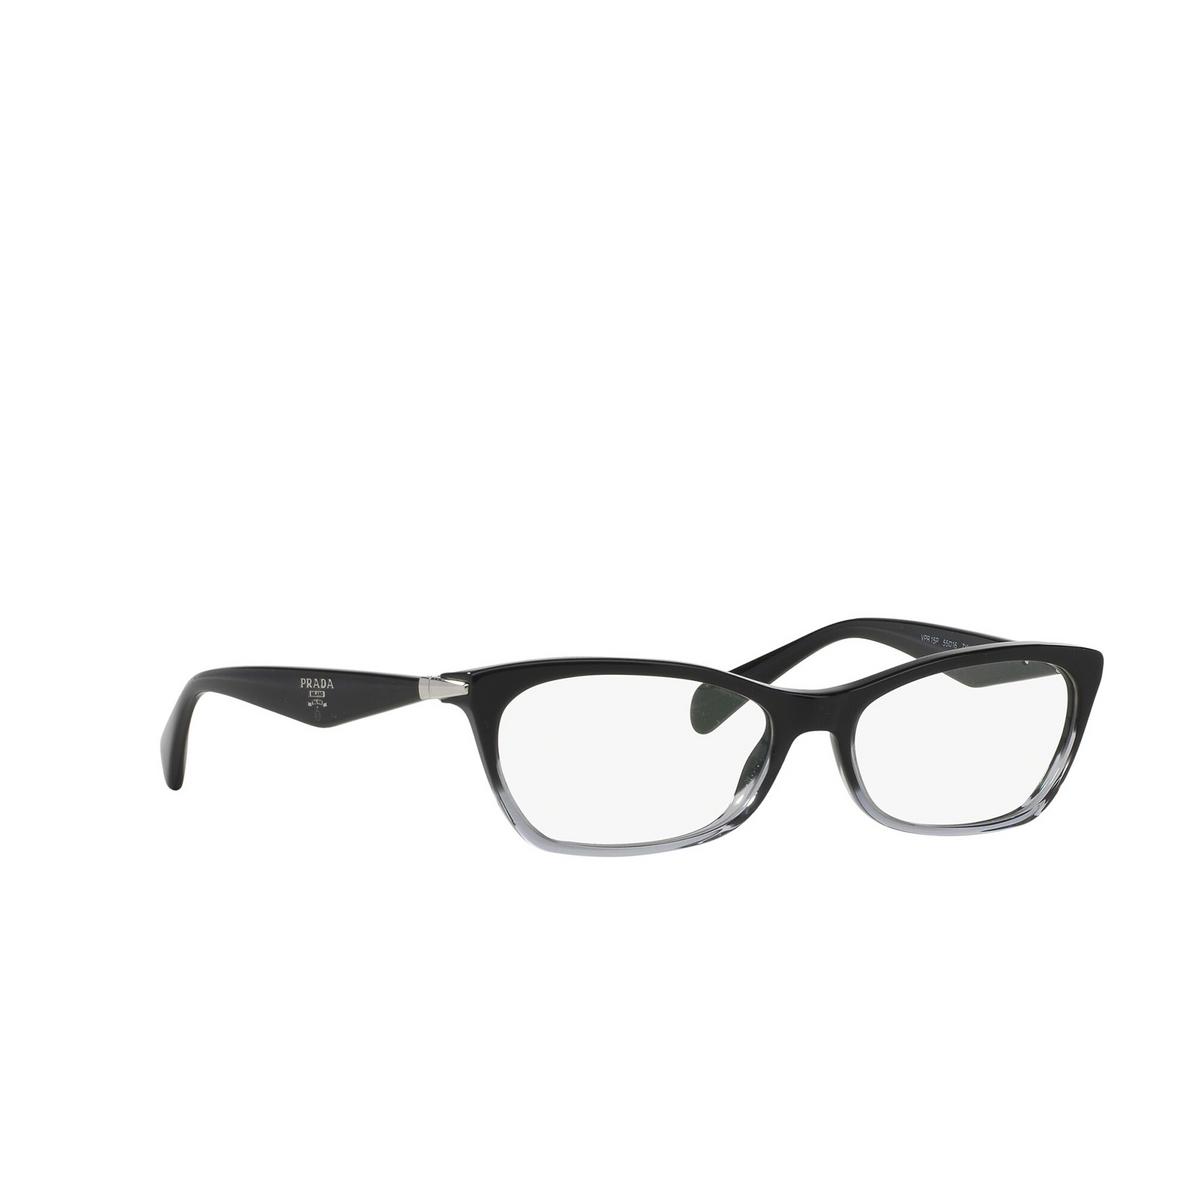 Prada® Cat-eye Eyeglasses: Catwalk PR 15PV color Black Gradient Transparent ZYY1O1 - three-quarters view.